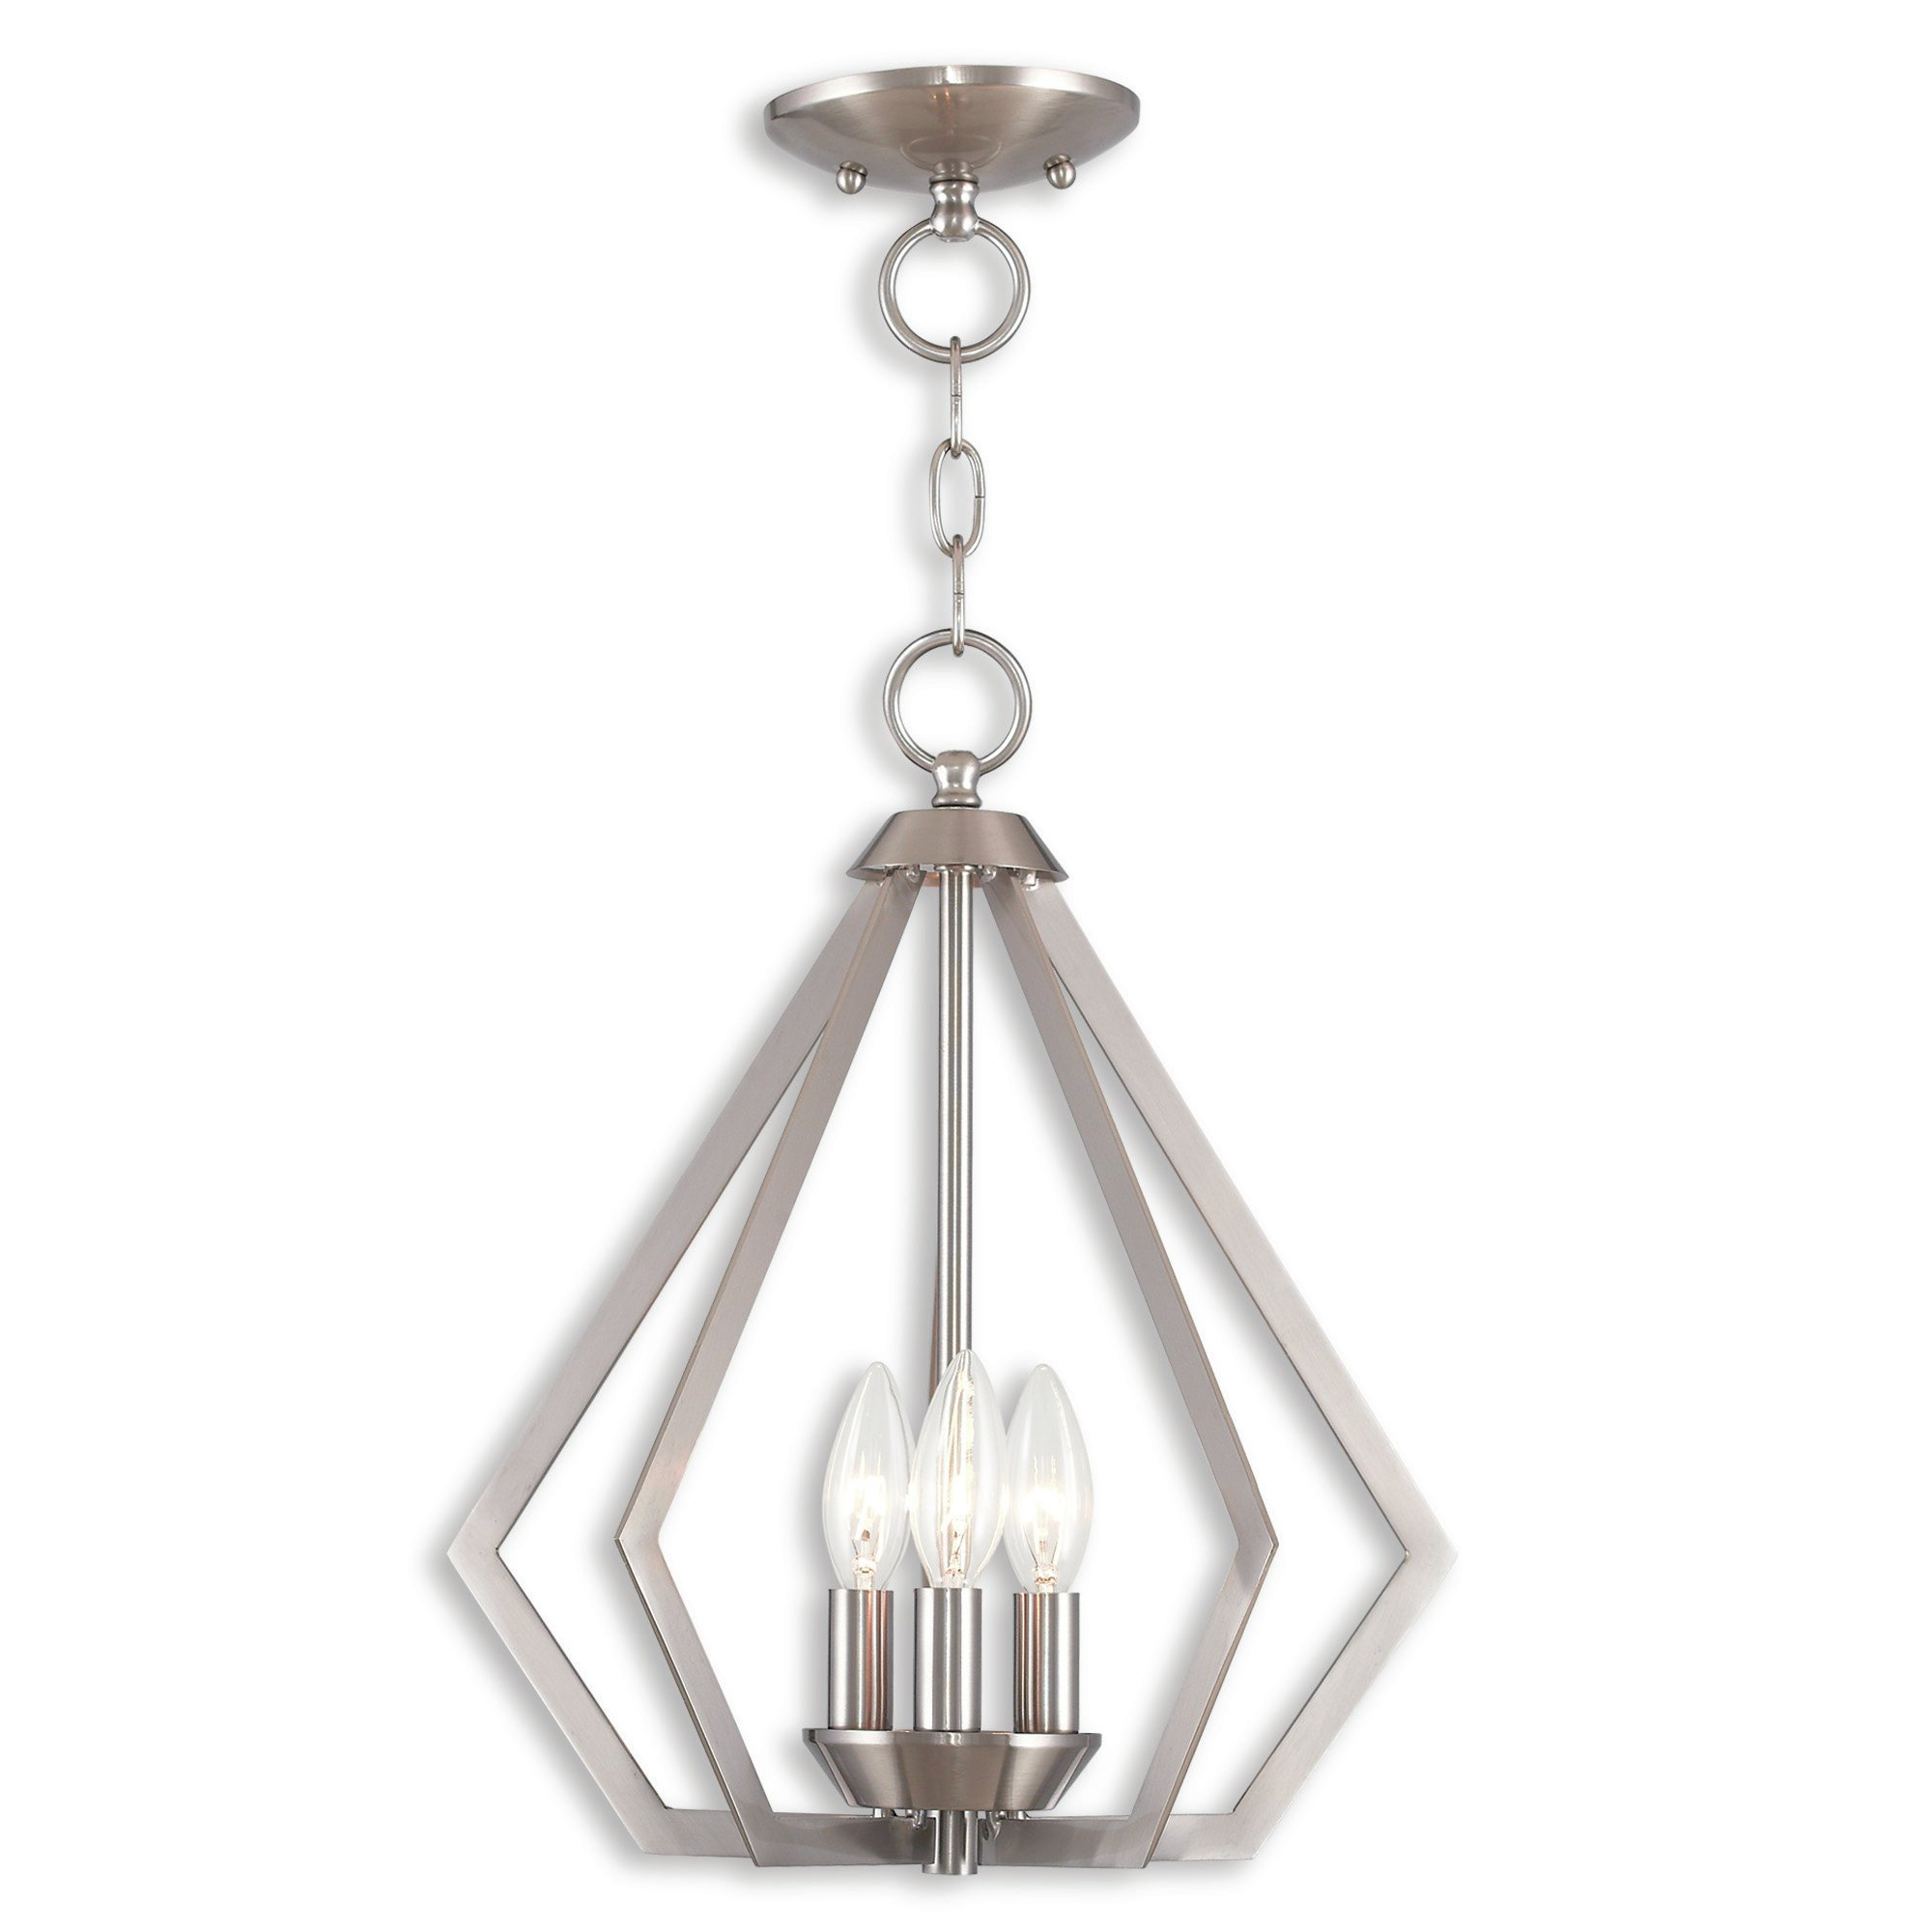 Borasisi 3 Light Lantern Geometric Pendant For Widely Used Chauvin 3 Light Lantern Geometric Pendants (View 5 of 20)